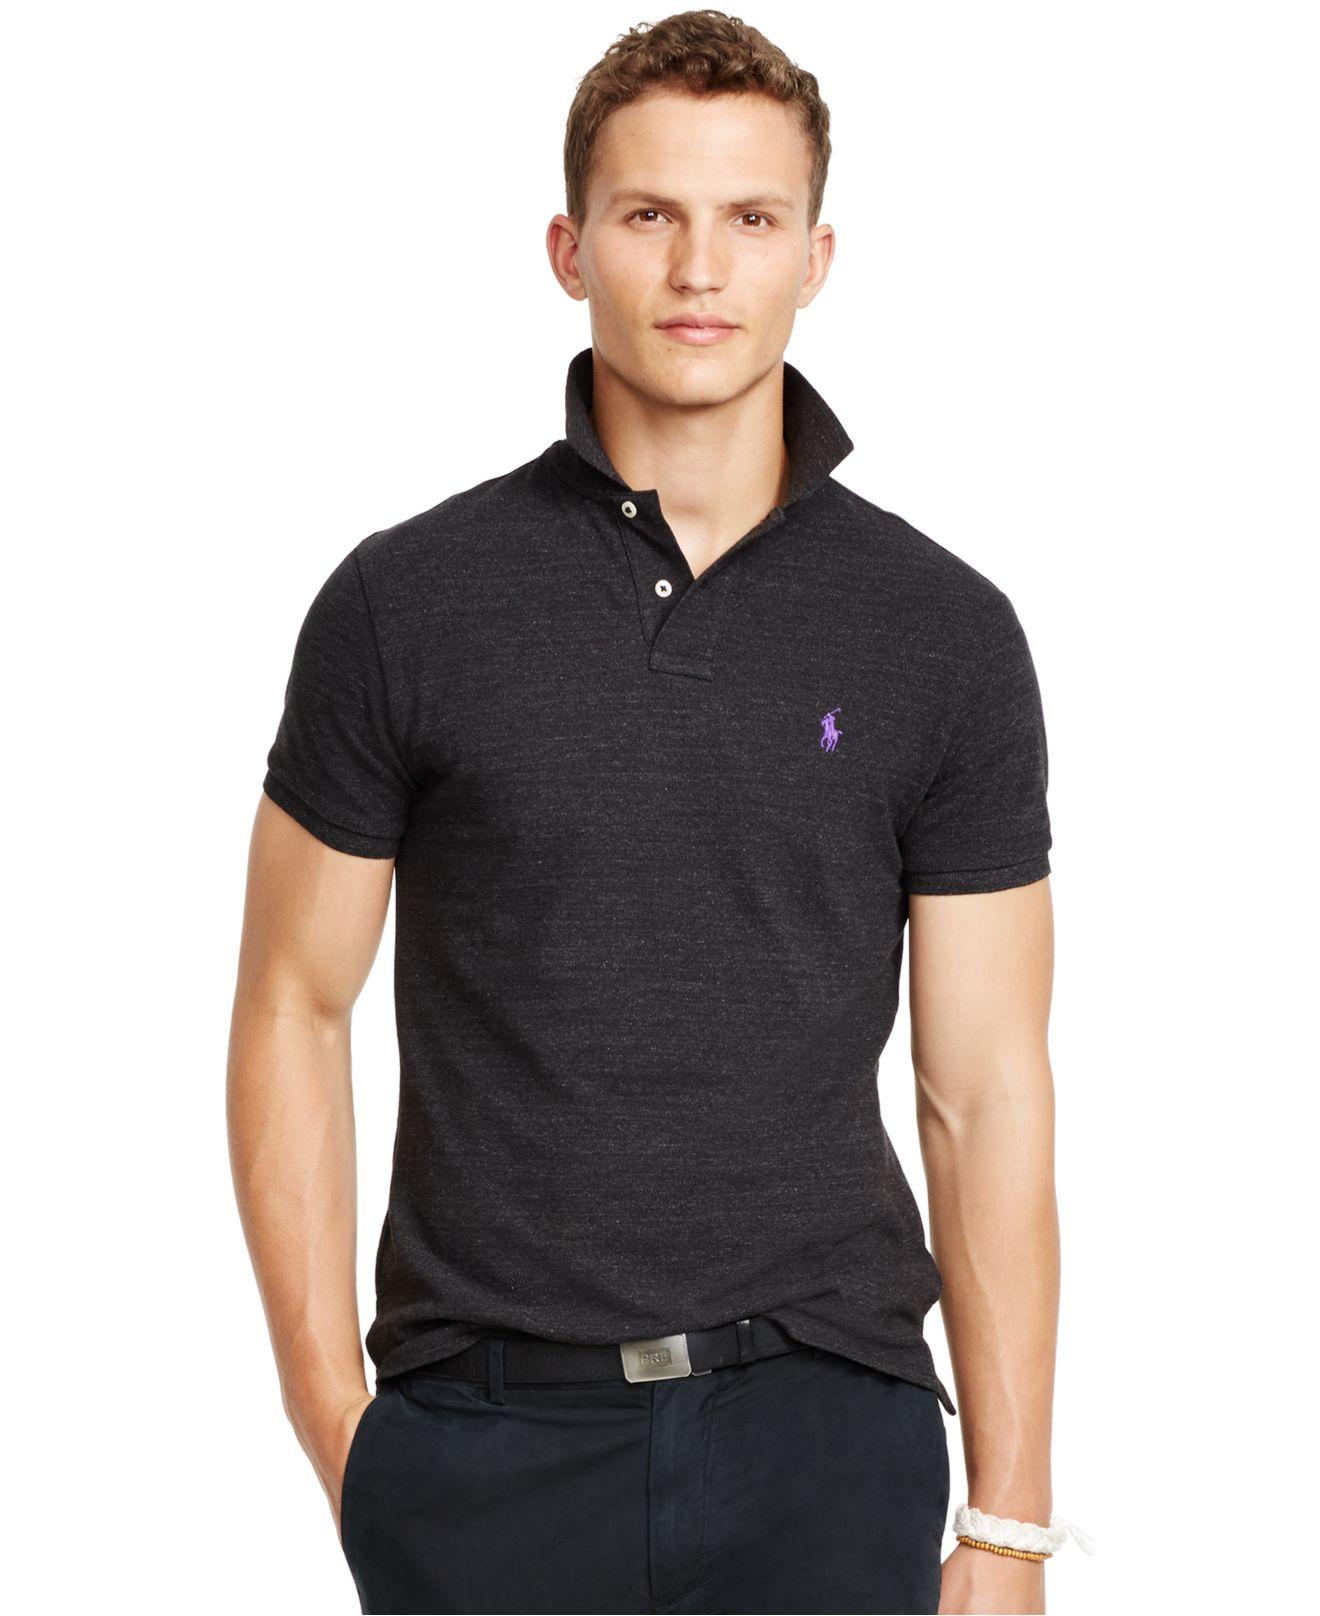 Polo ralph lauren custom fit mesh polo shirt in black for for Polo ralph lauren custom fit polo shirt